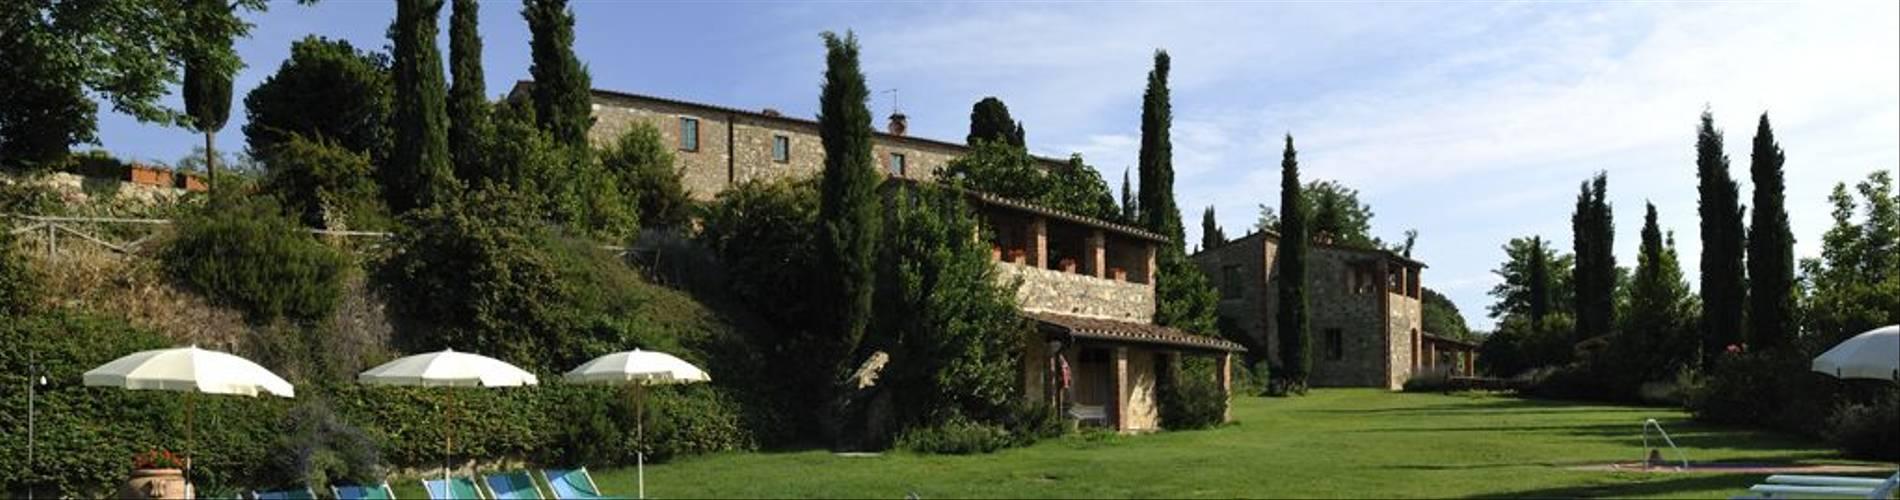 Borgo Casabianca 11.jpg